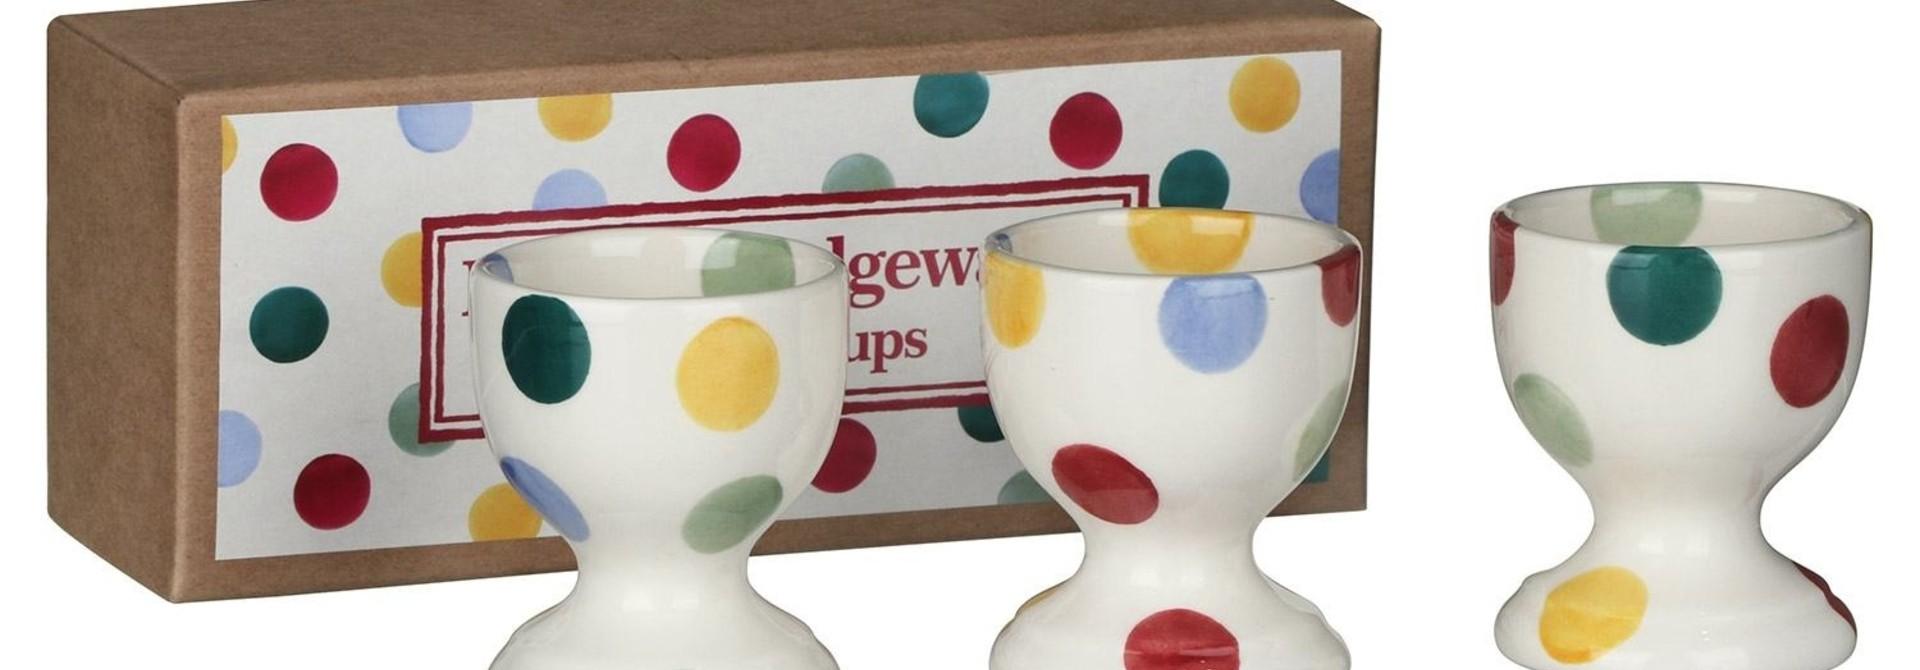 Polka Dot Set Of 3 Egg Cups - Boxed